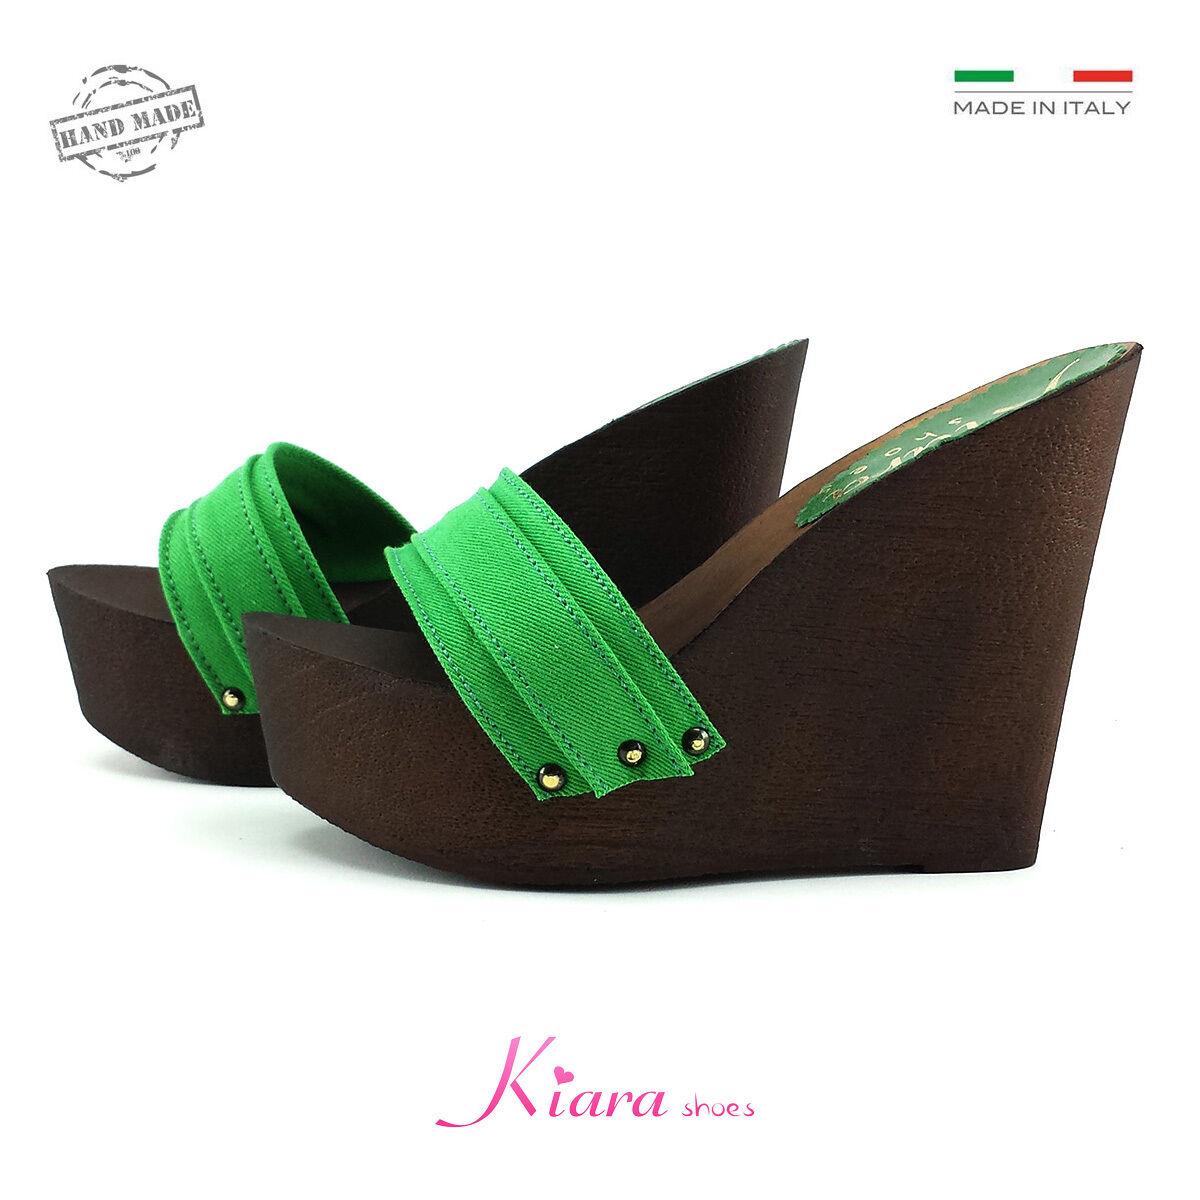 Zeppe Zatteroni Zoccoli Verdi - Scarpe Made in Italy N. da 35 a 41 - Tacco 13